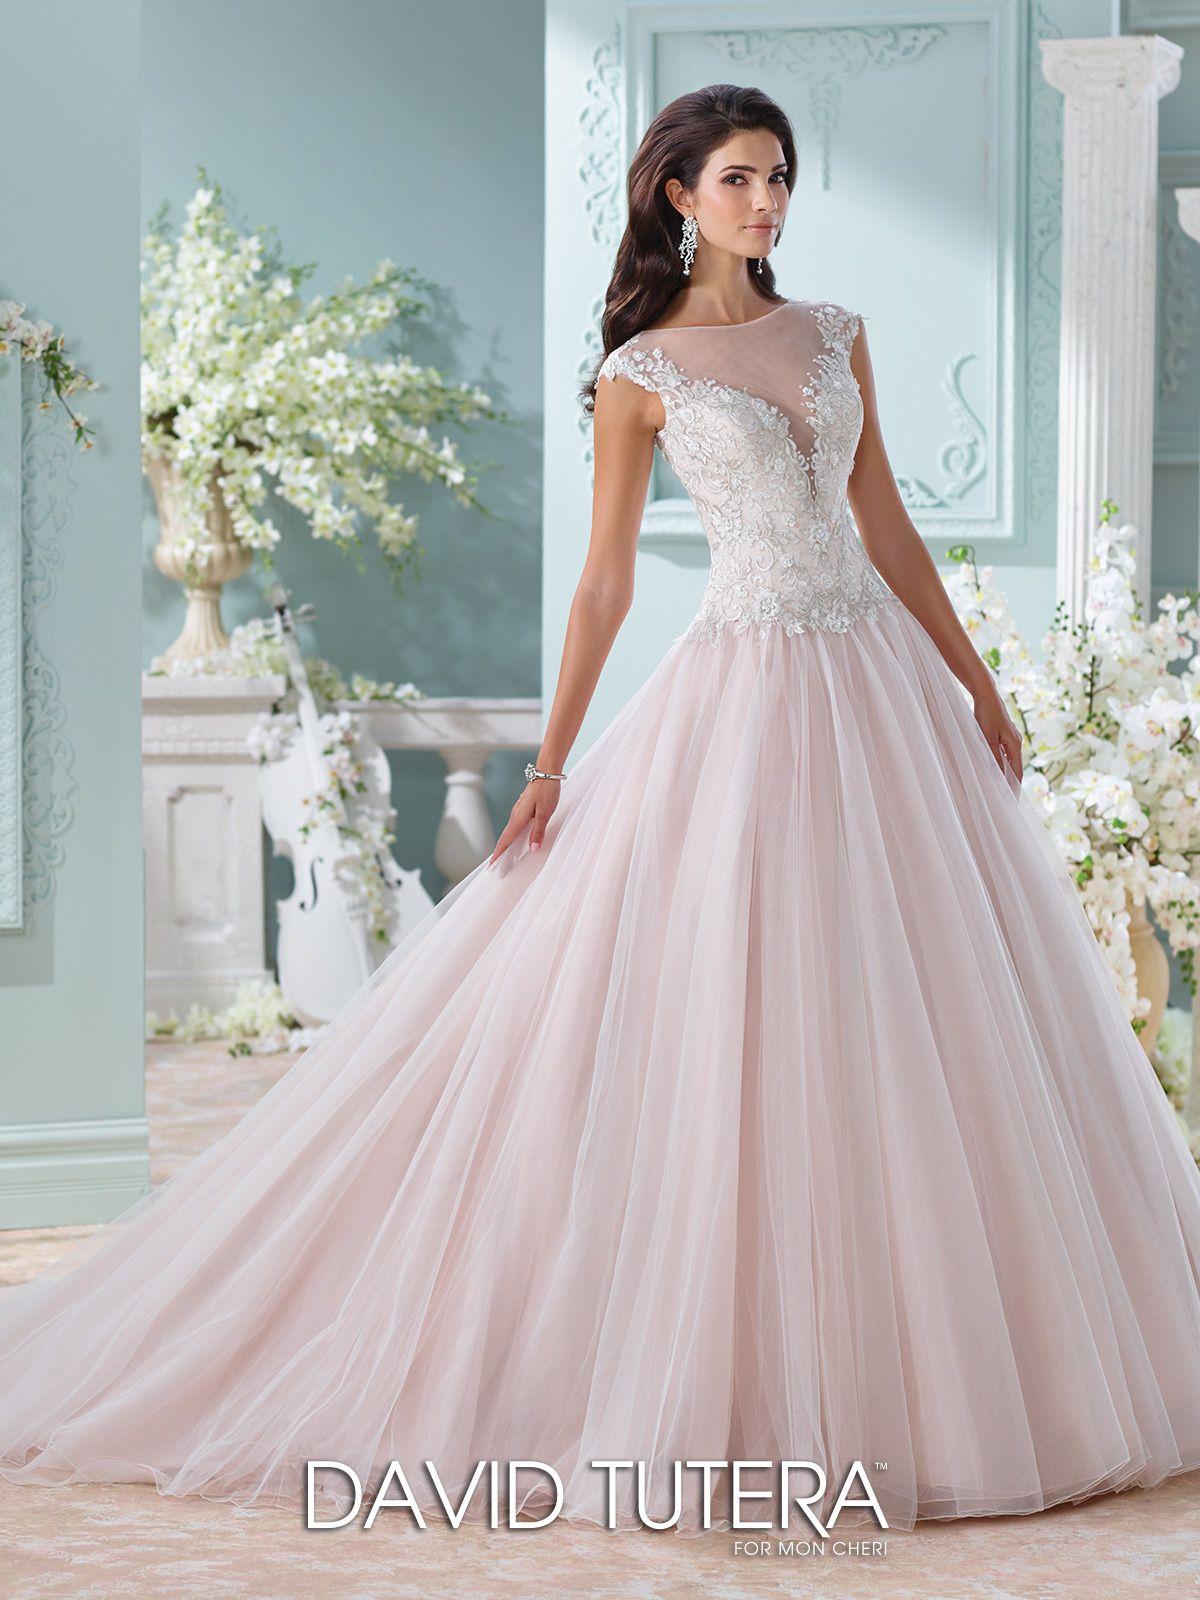 Handbeaded illusion neckline with lace wedding dress idalia